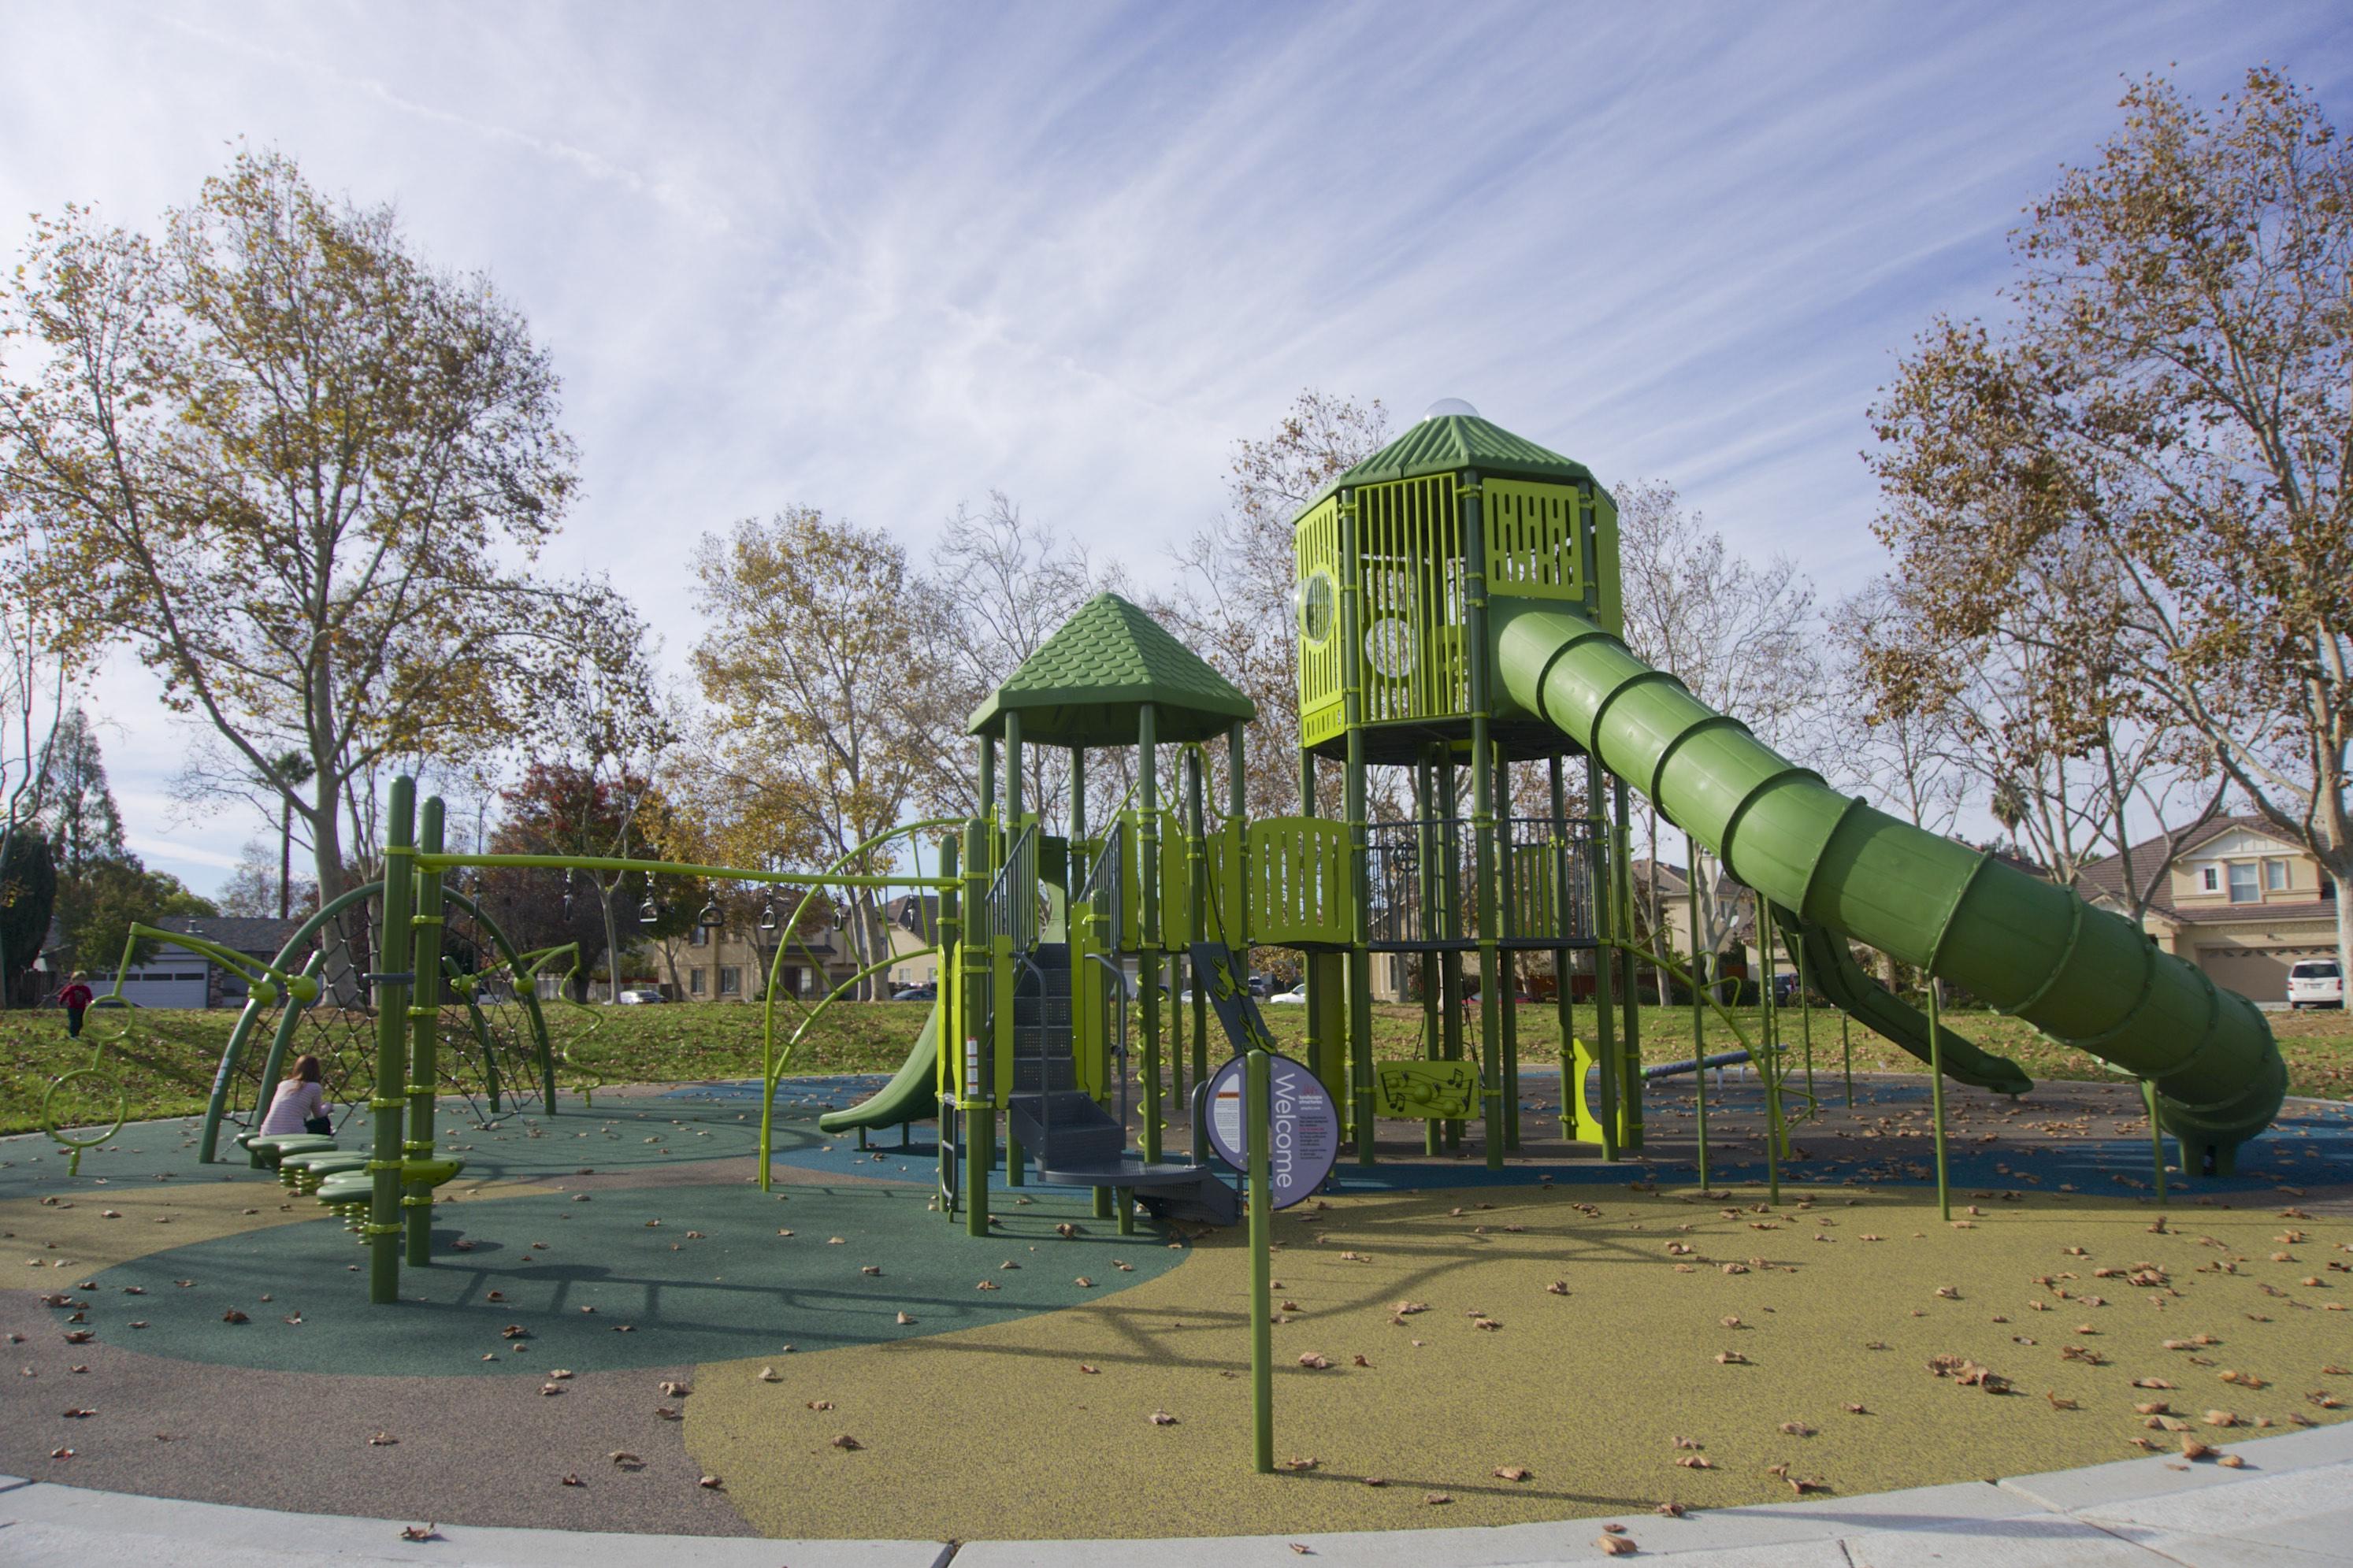 Playground Equipment Ross Recreation Ross Recreation